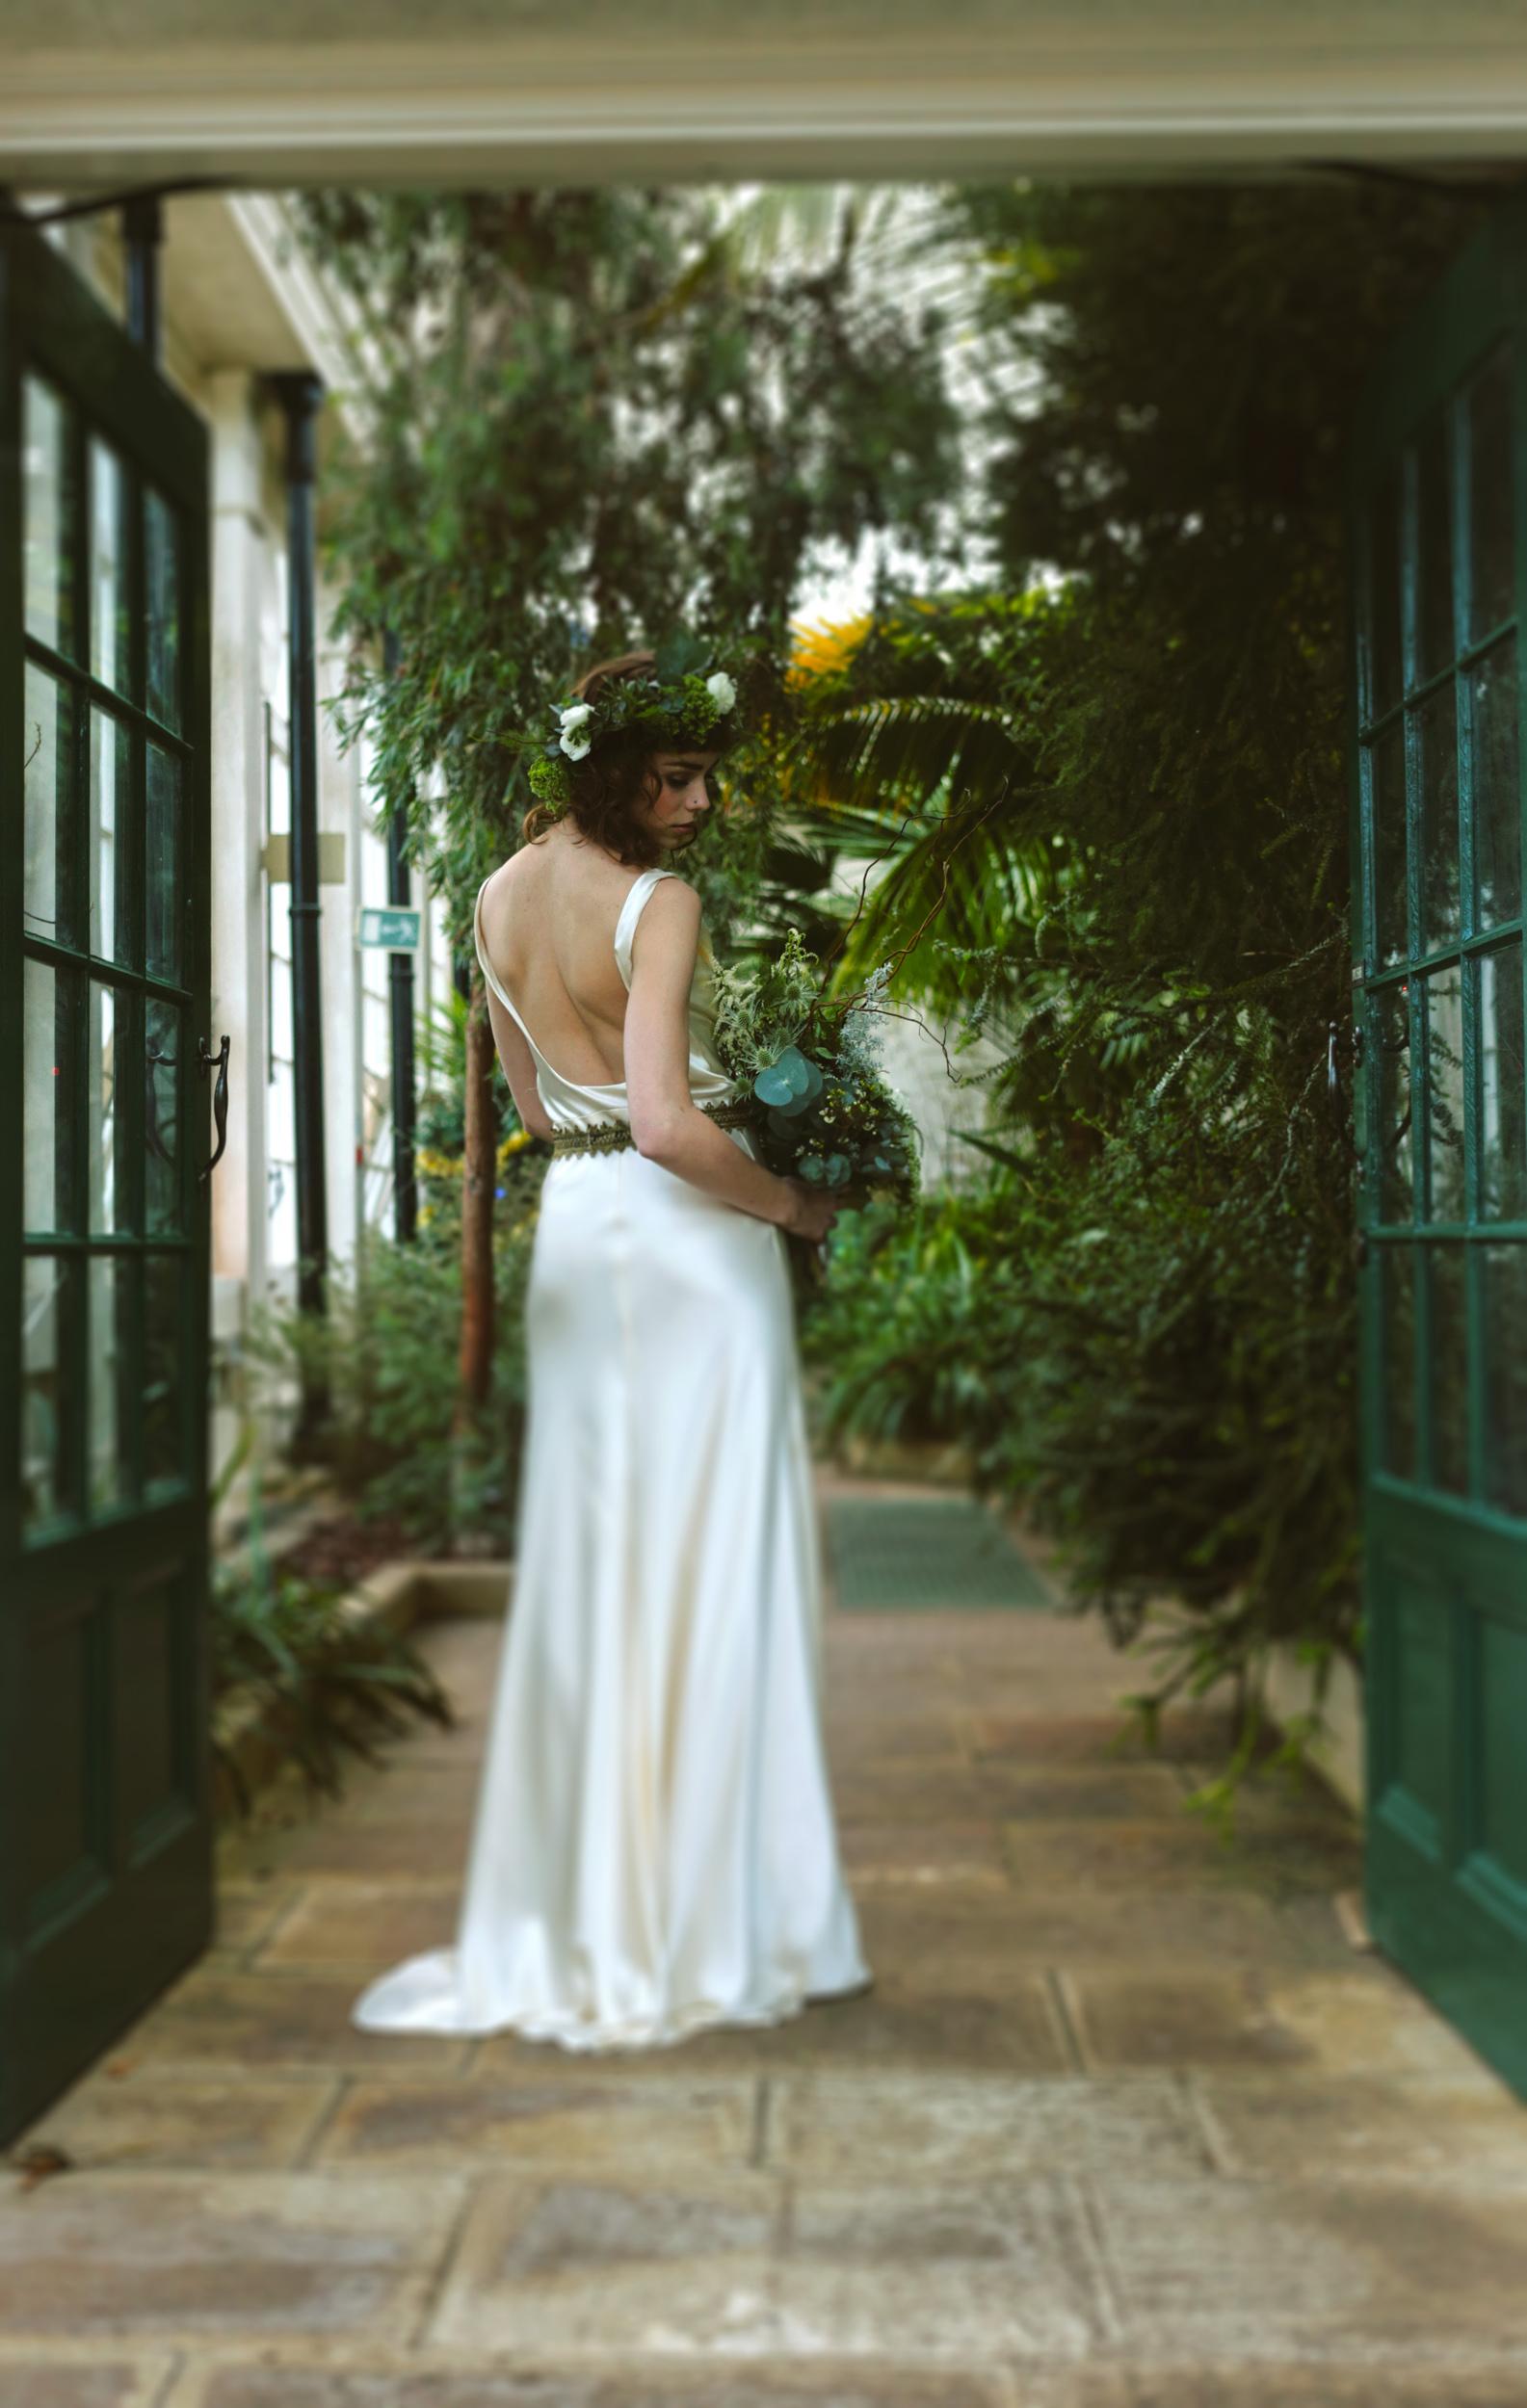 Winter-Bridal-Kate-Beaumont-Shelley-Richmond-Vintage-Wedding-Dress-9.jpg